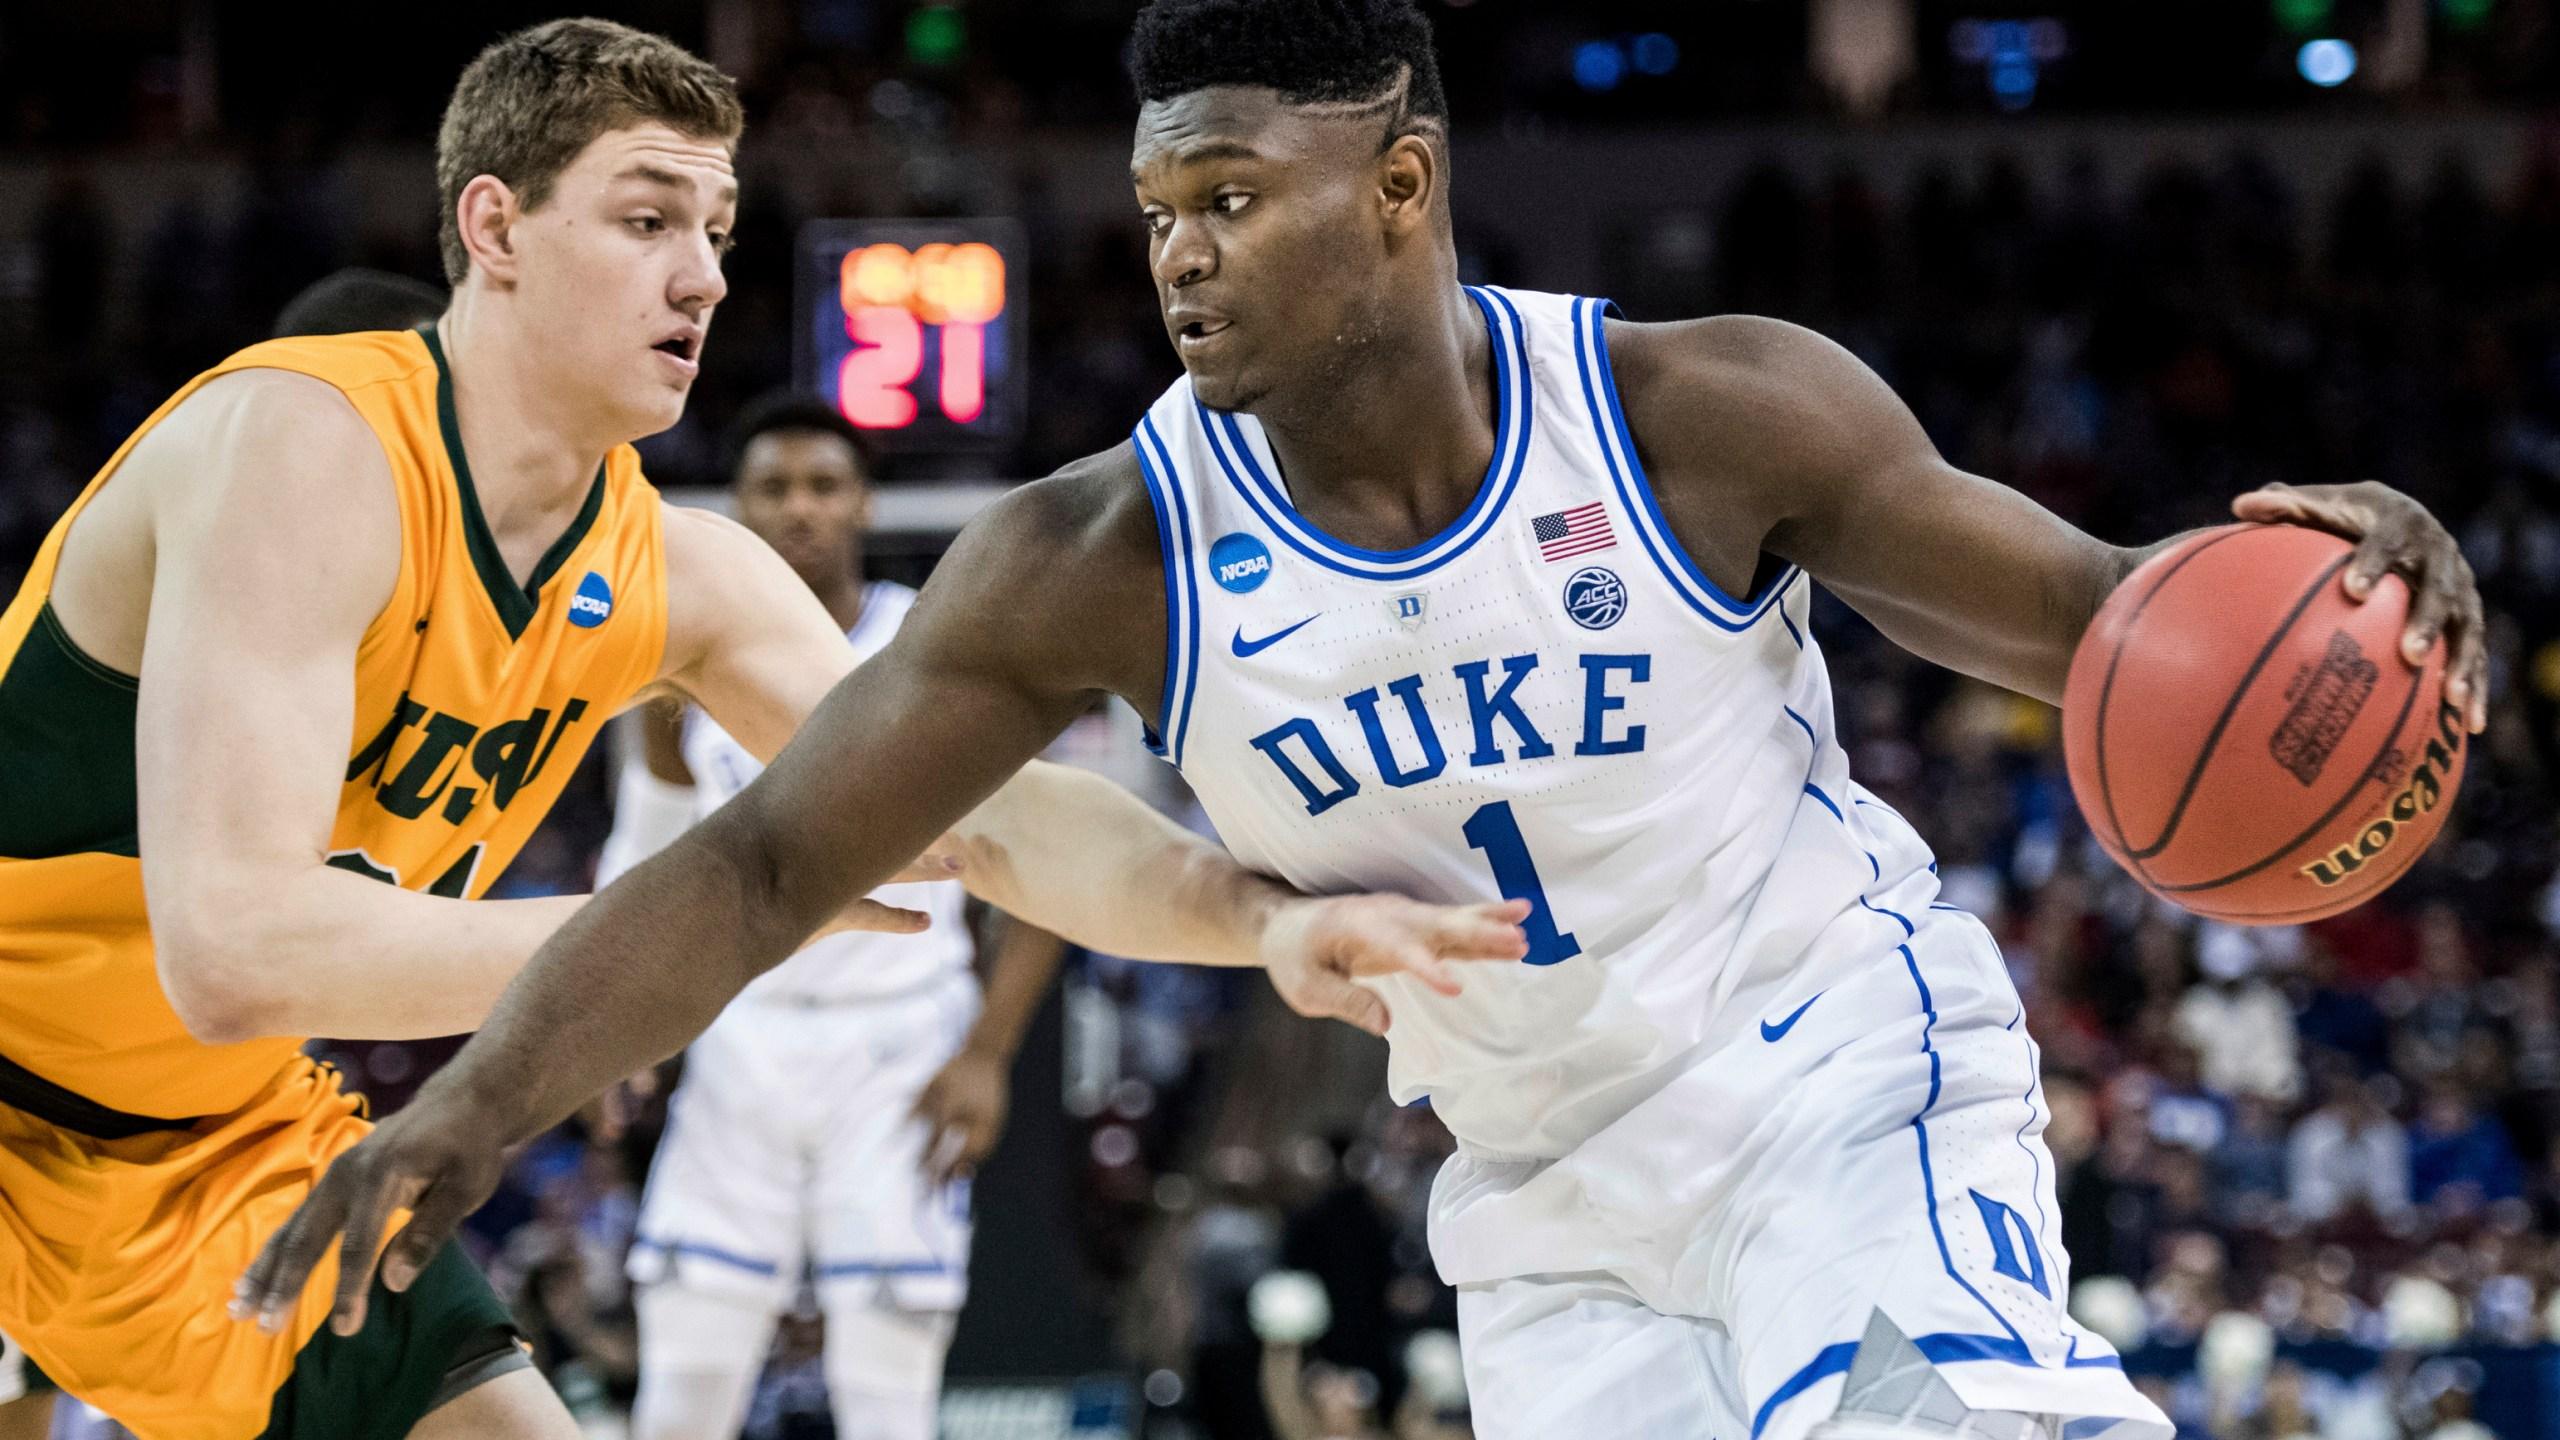 NCAA_North_Dakota_St_Duke_Basketball_38830-159532.jpg60636438